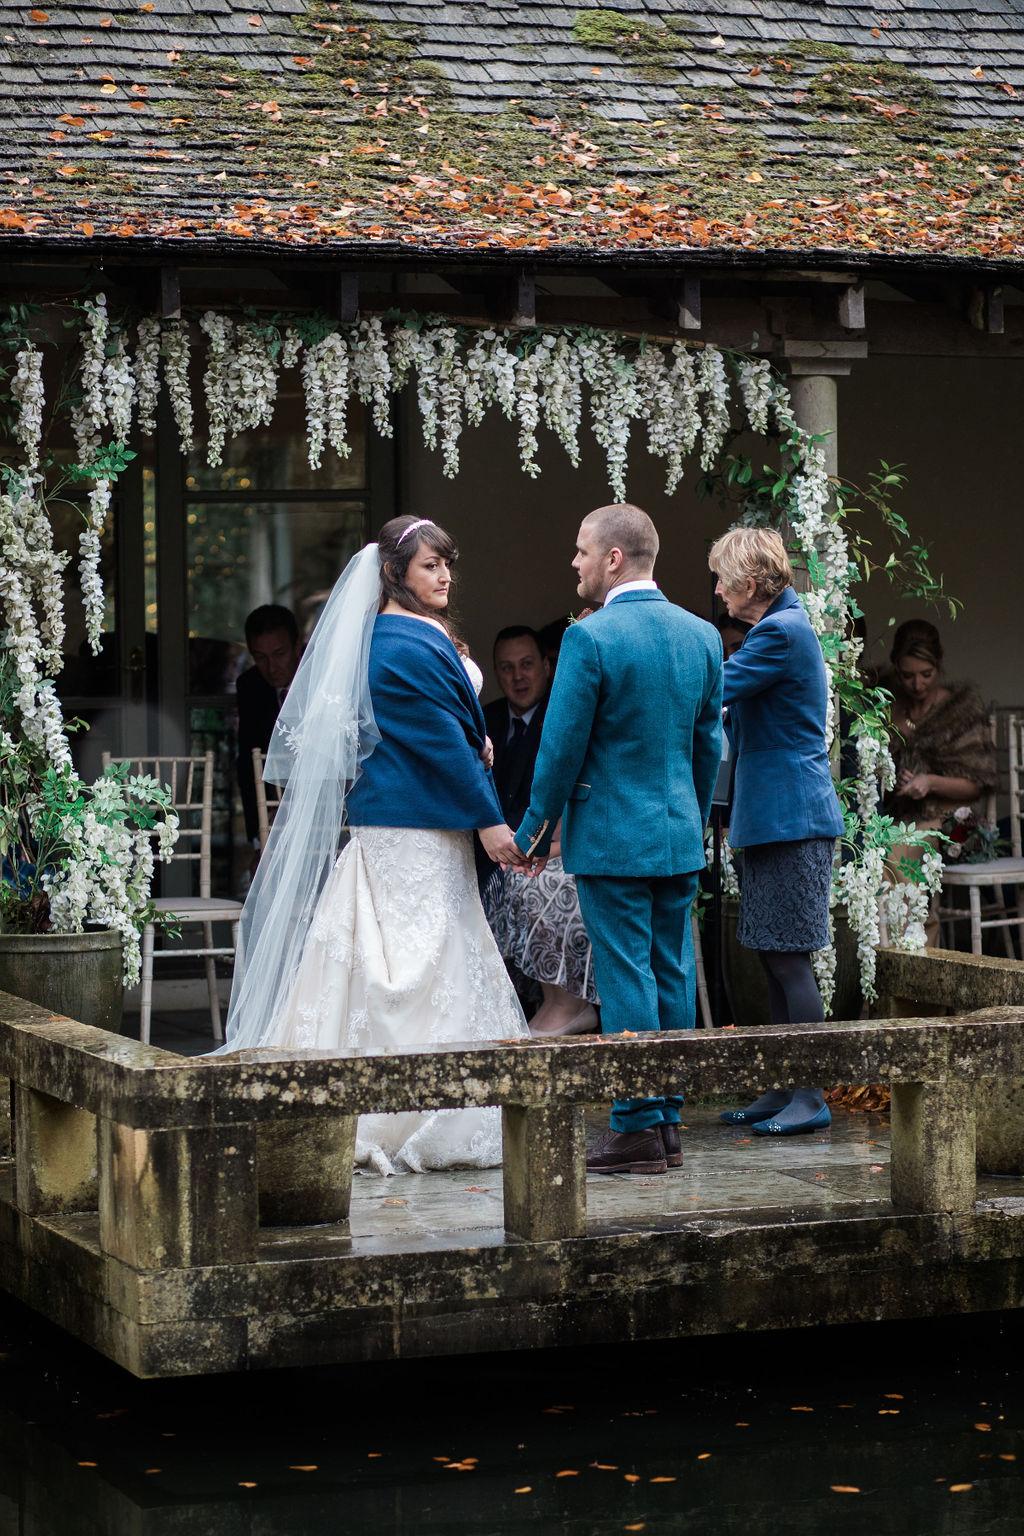 Your_Wedding_Day_160.jpg